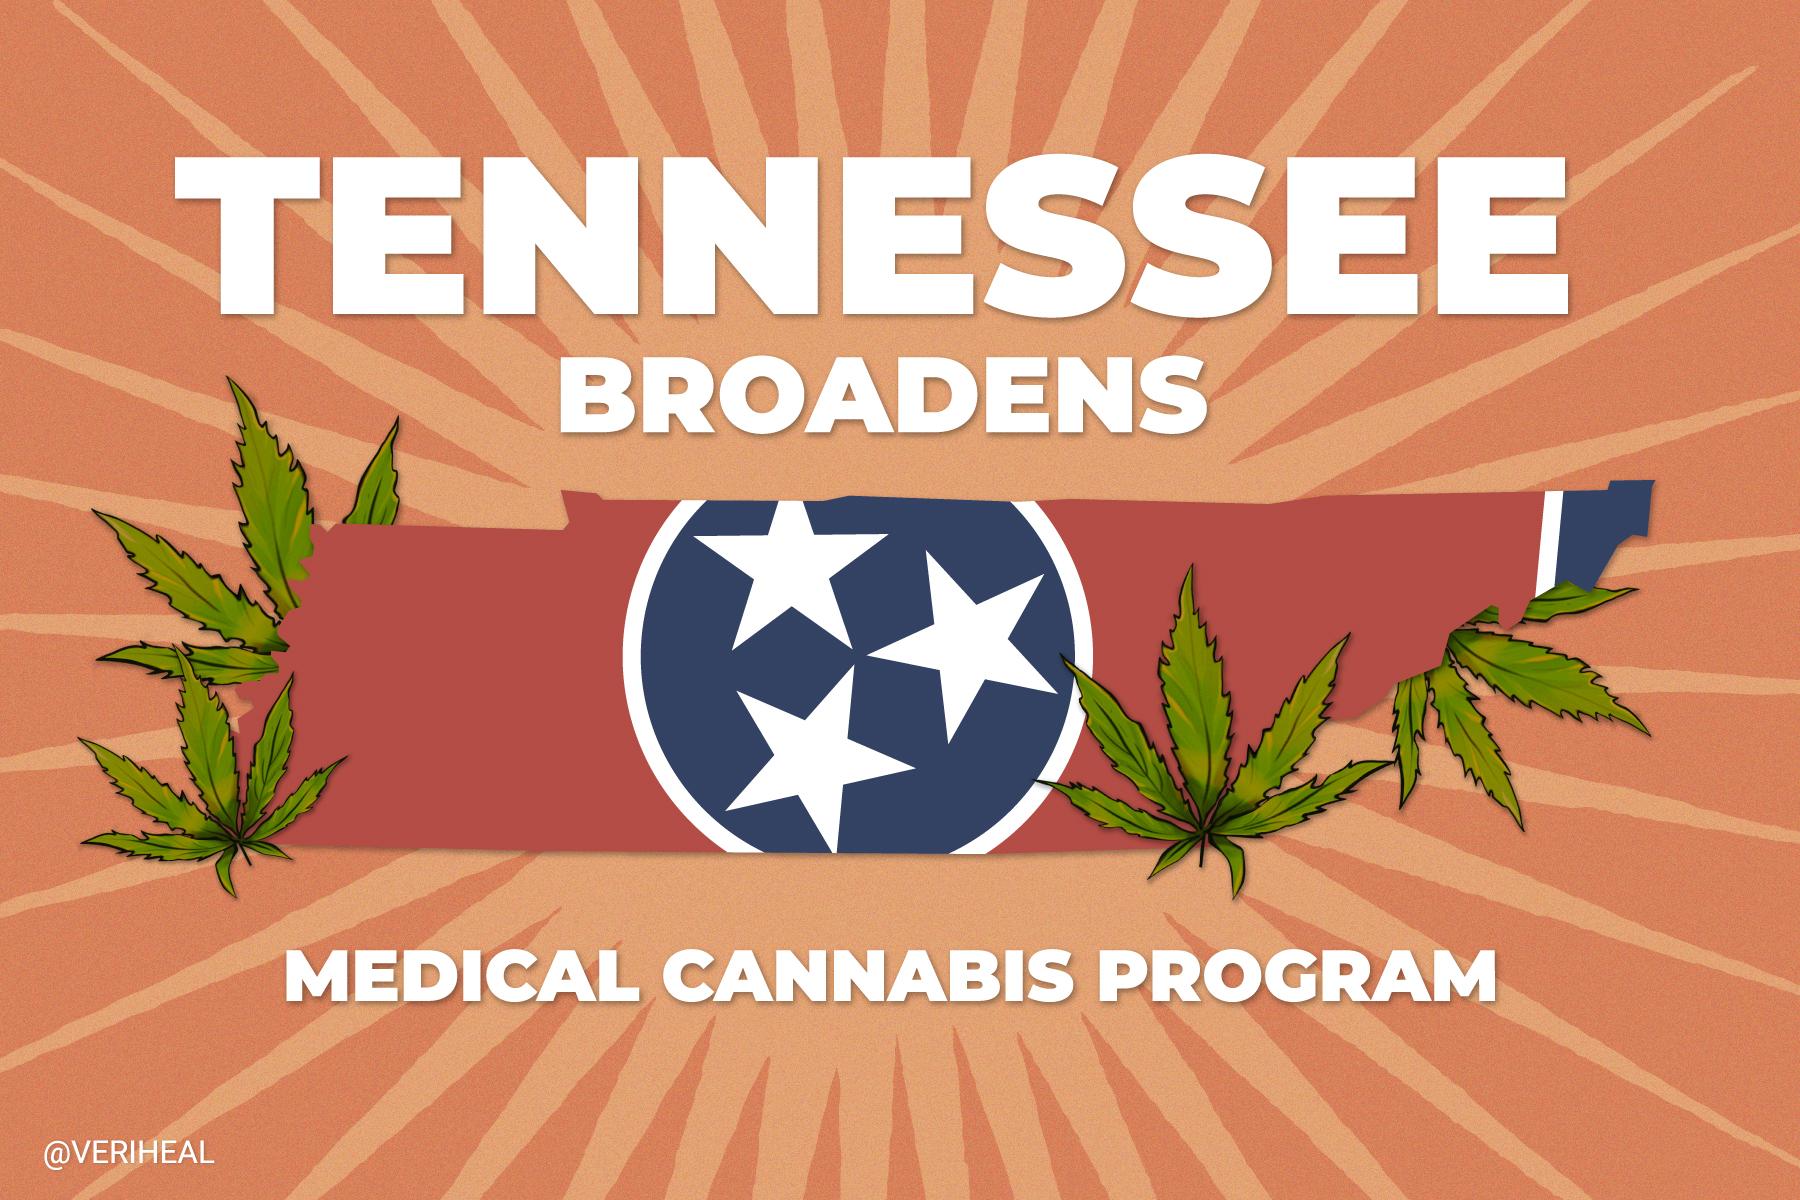 Tennessee Broadens its Medical Cannabis Program